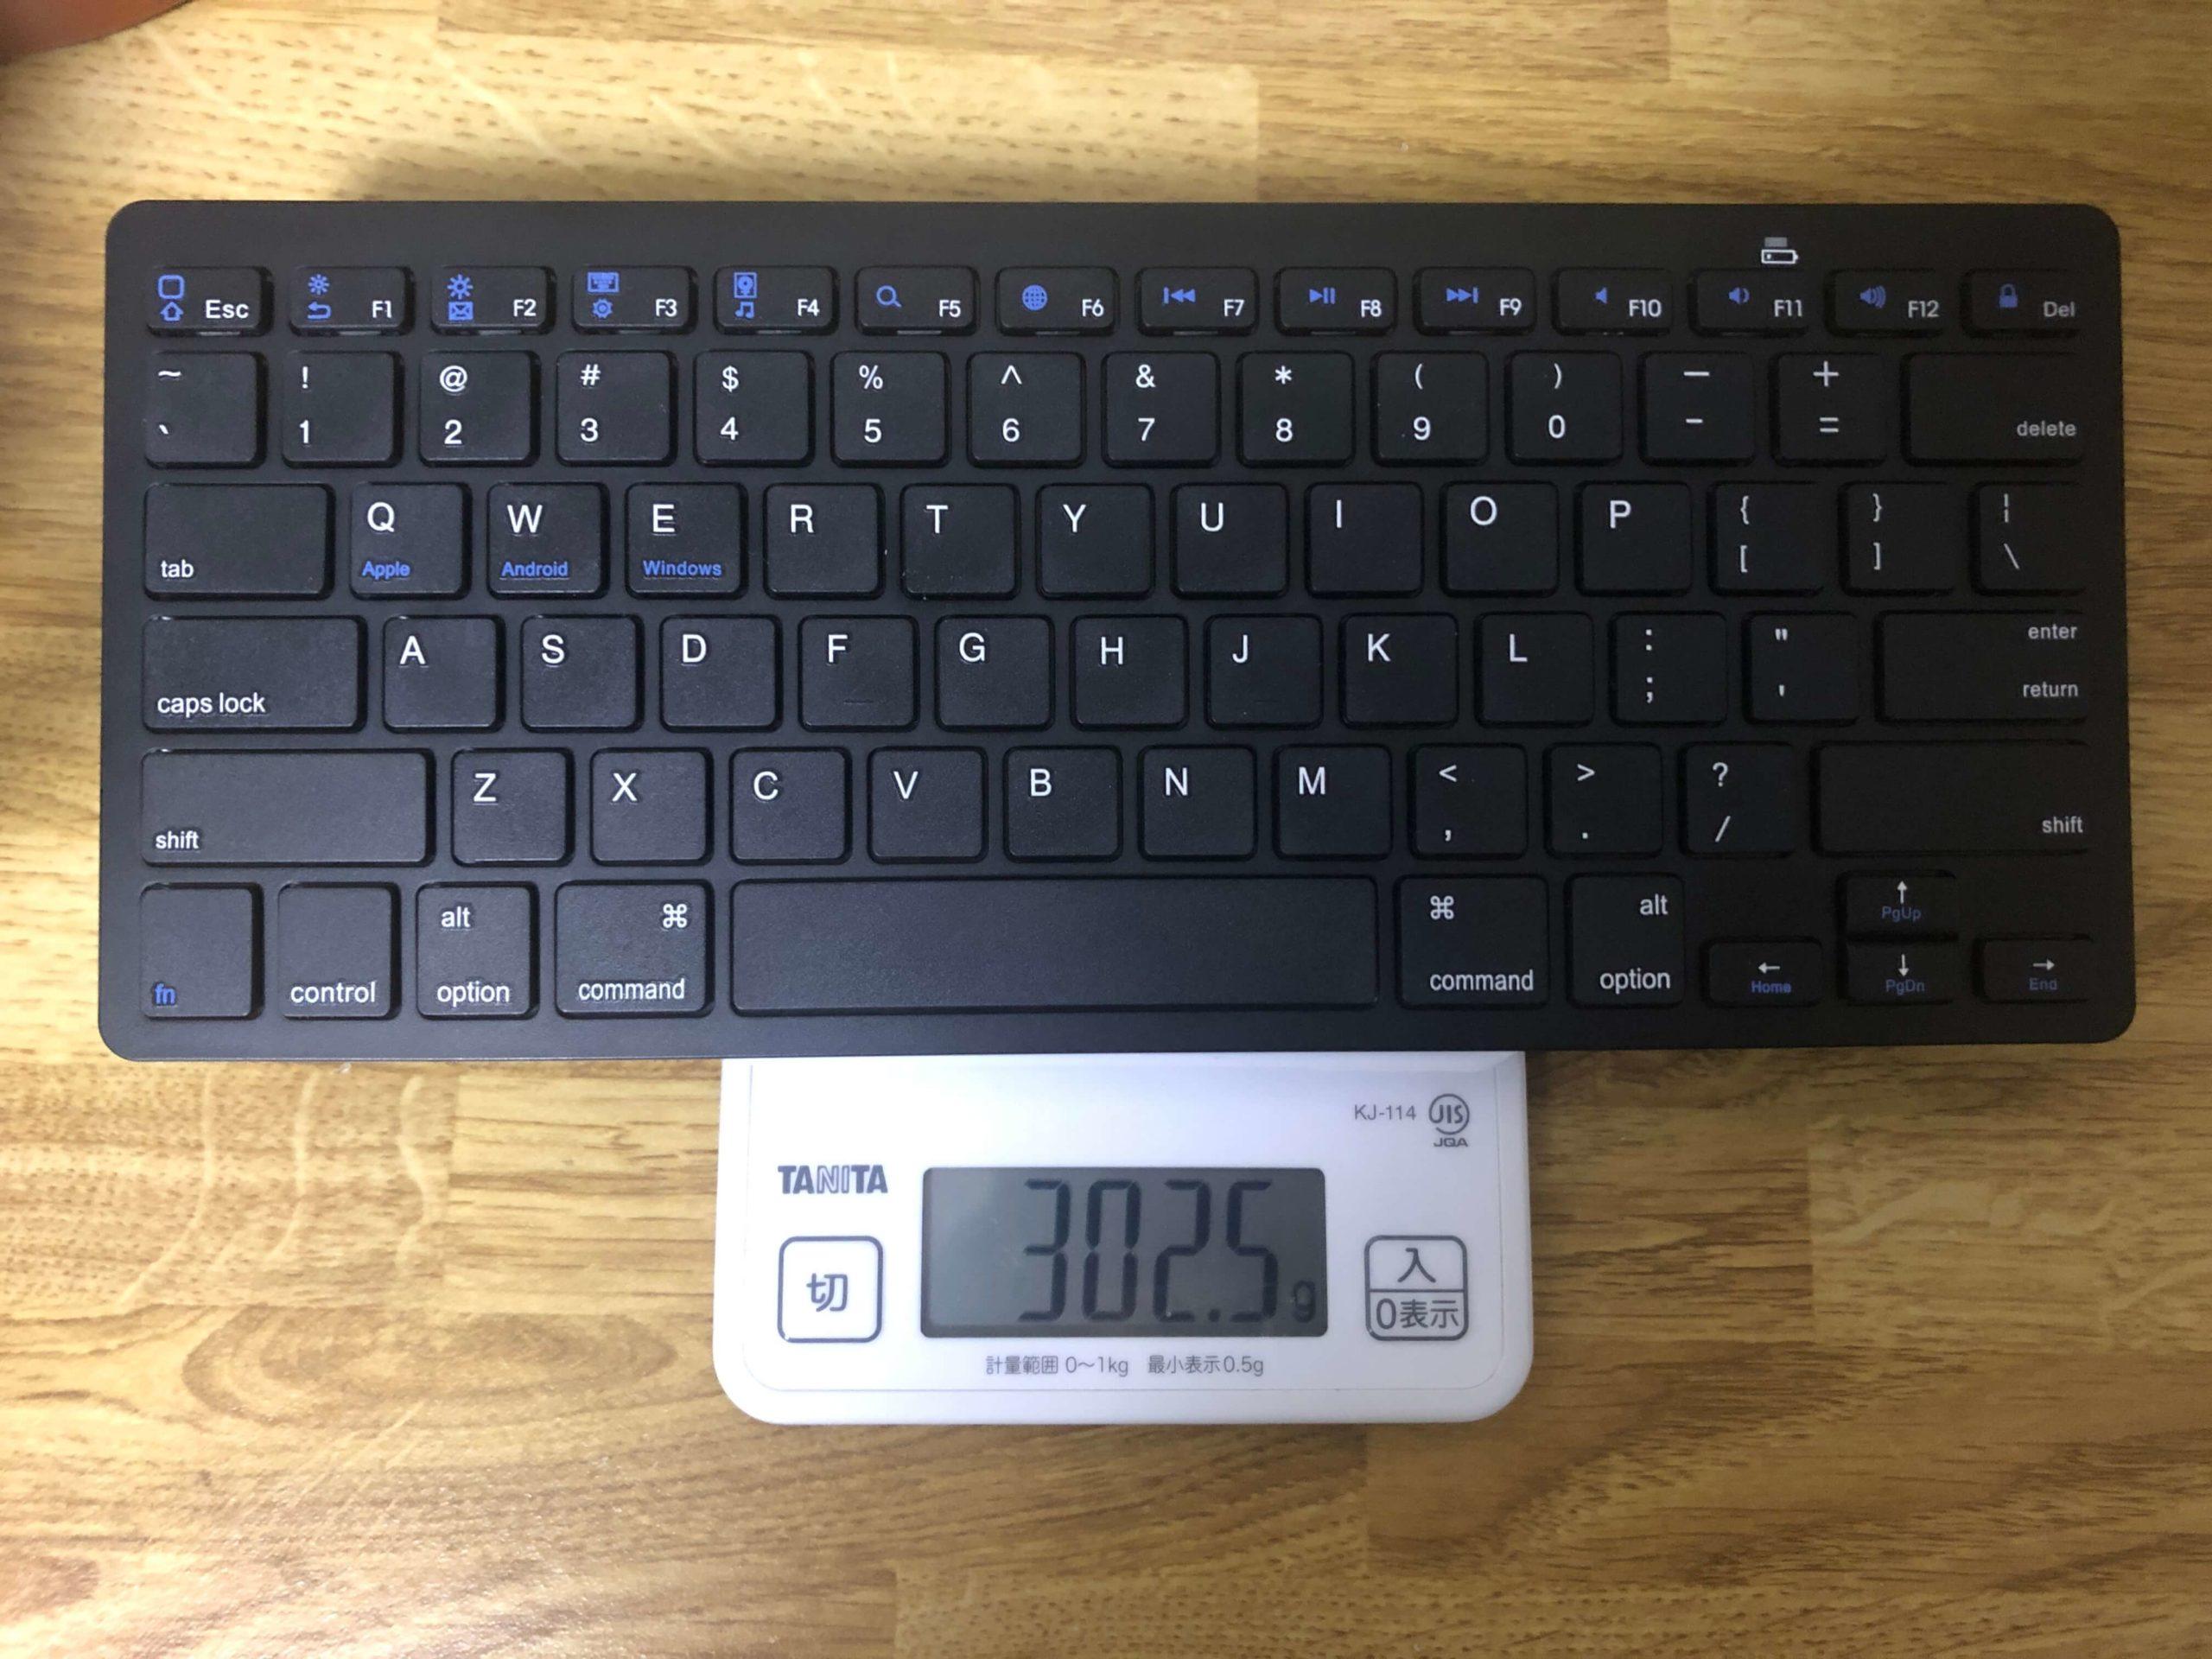 iPhoneと相性抜群なBluetoothキーボードは300gと軽量